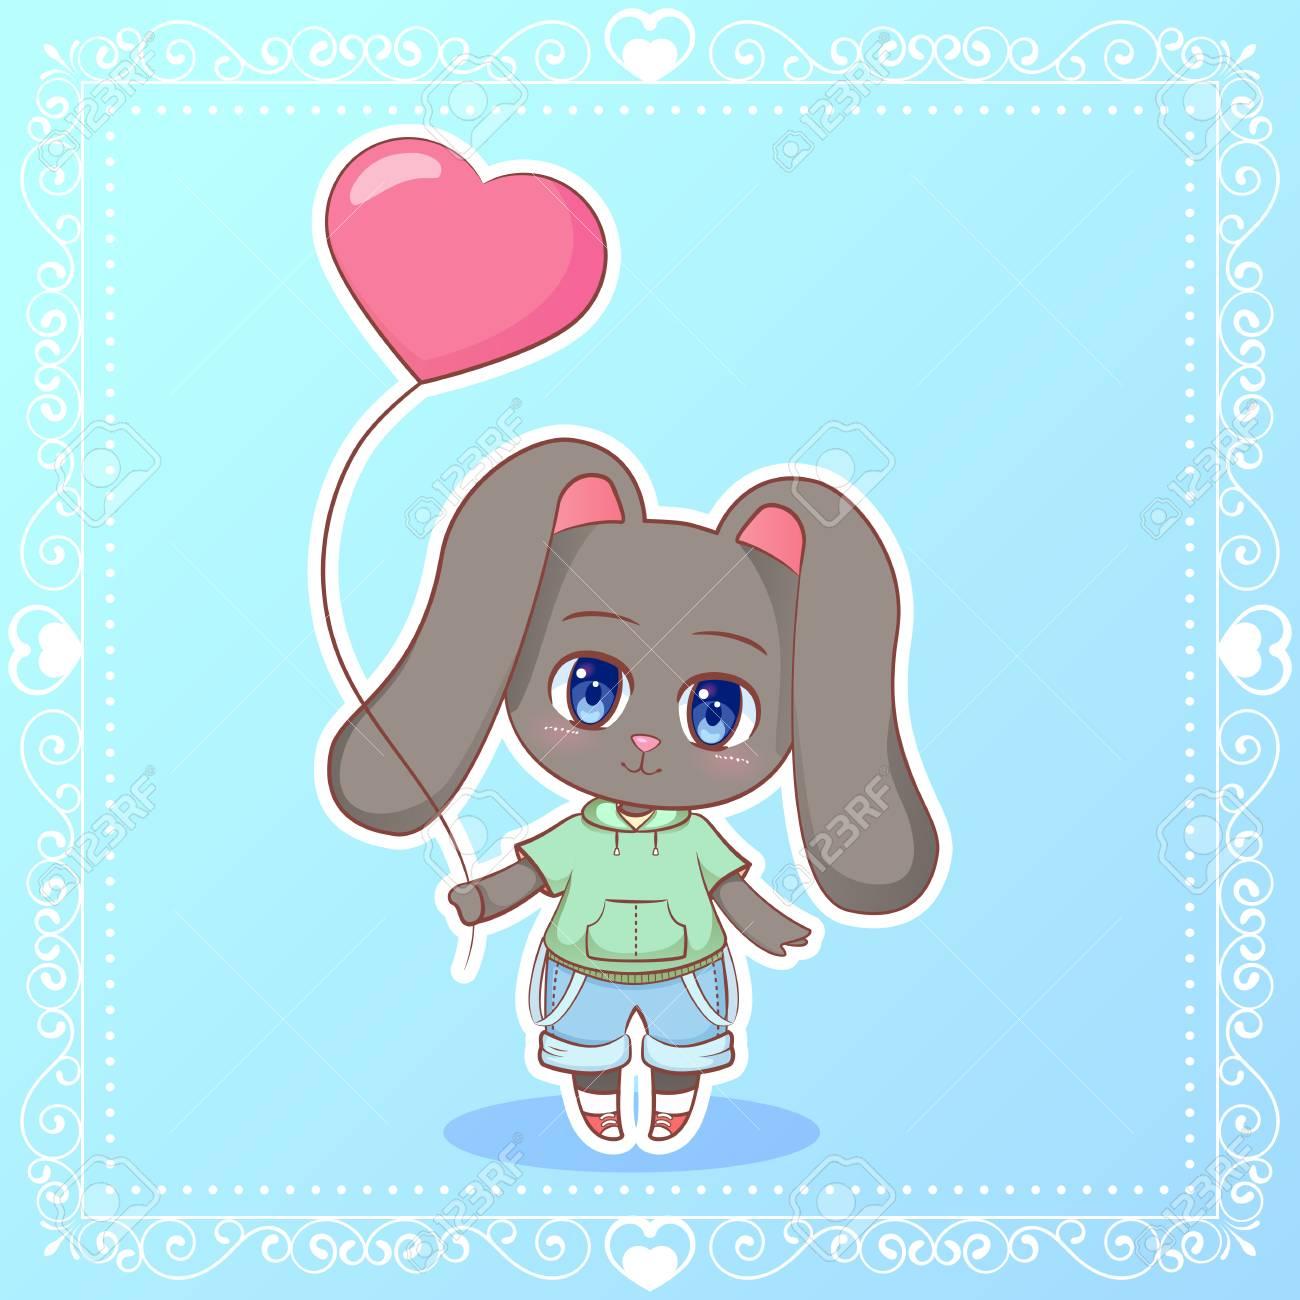 Lapin Doux Petit Mignon Kawaii Anime Dessin Anime Garcon Lapin Avec